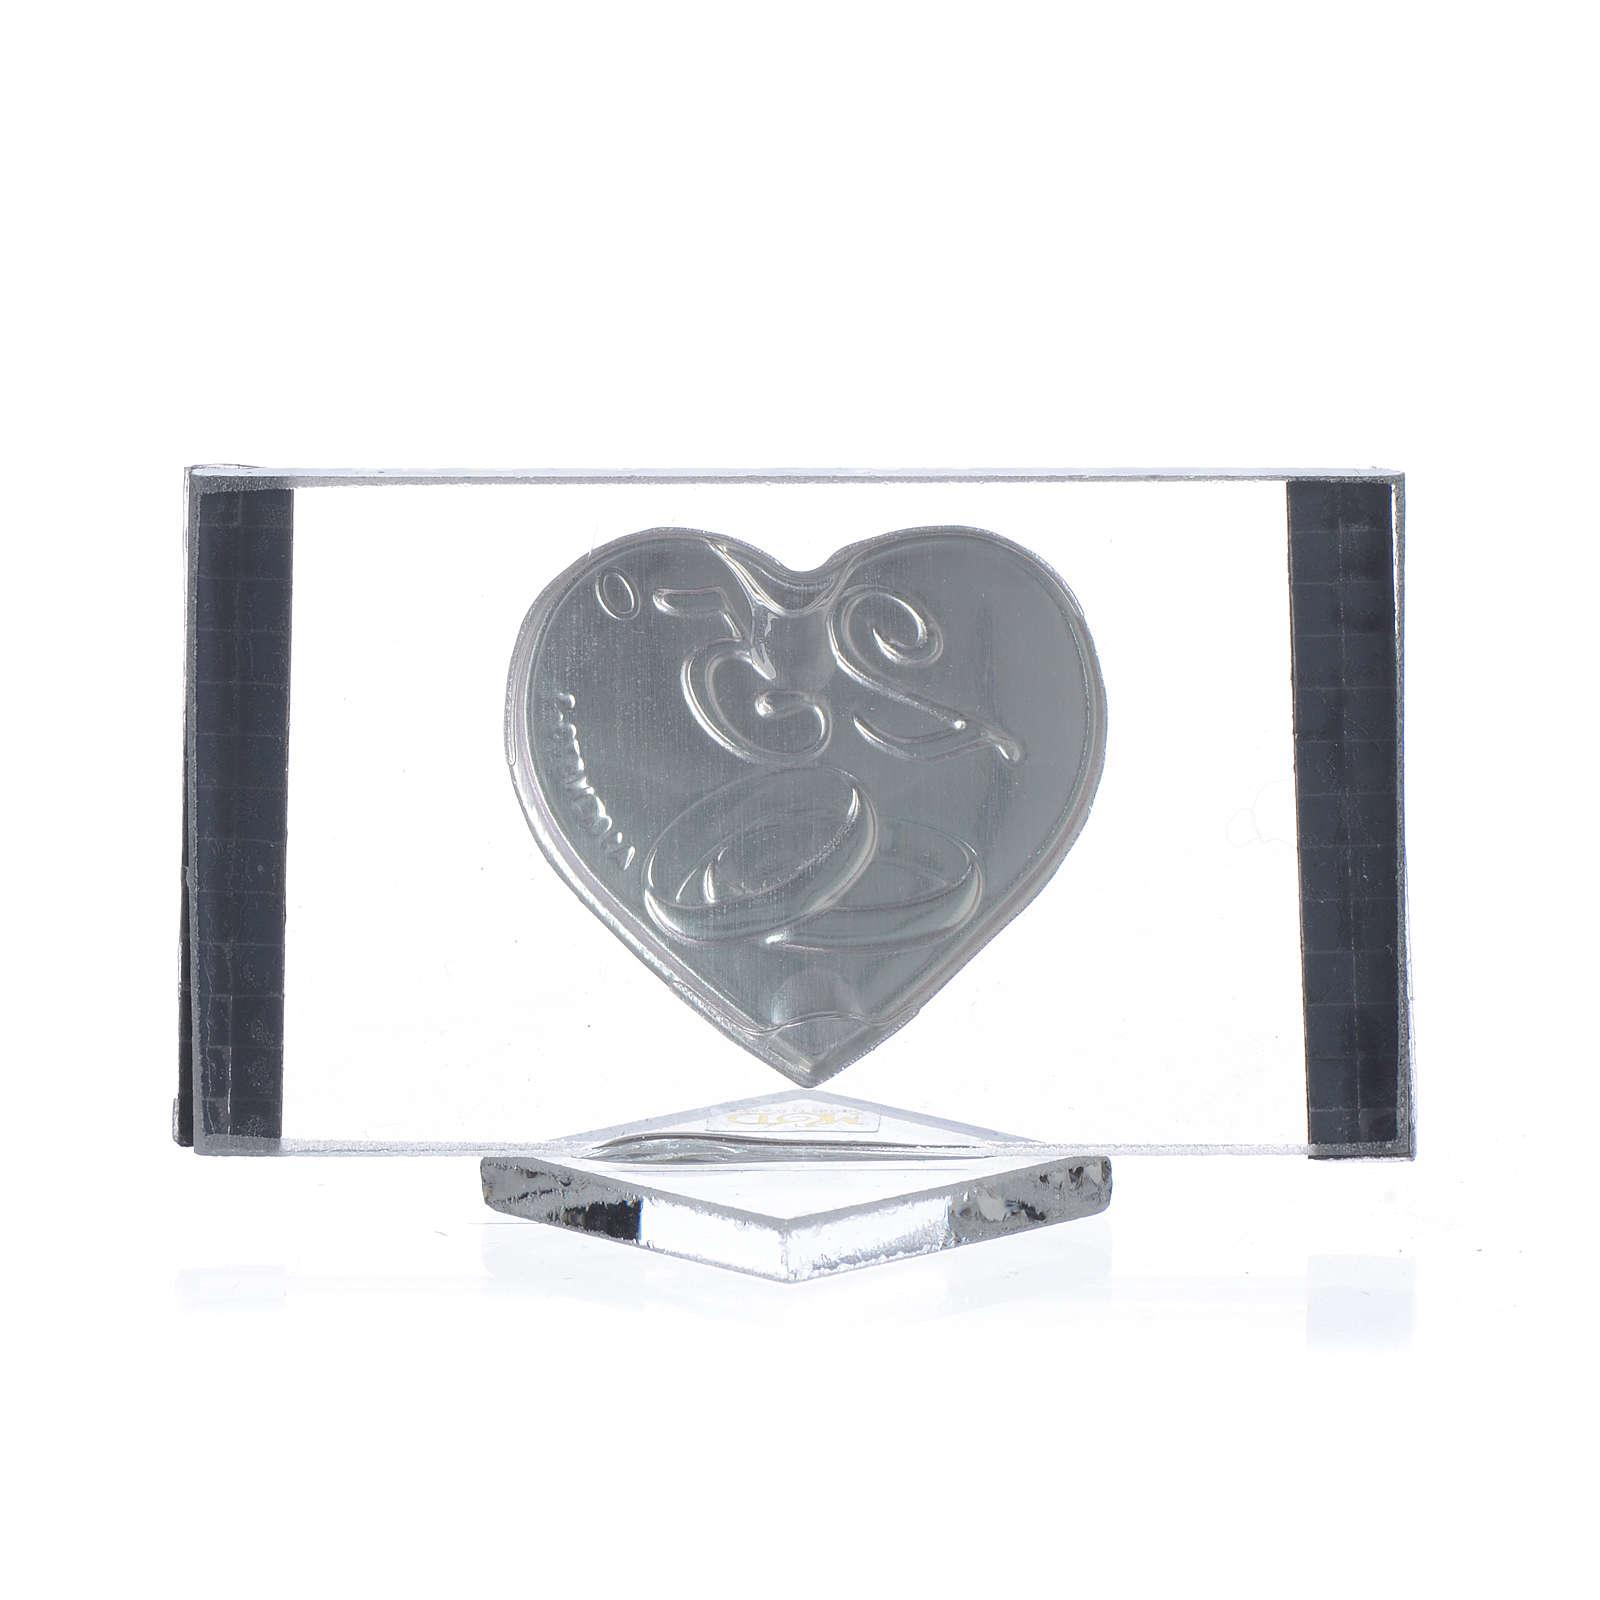 Bomboniera Anniversario 25 anni Quadro argento cm 4,5x7 3